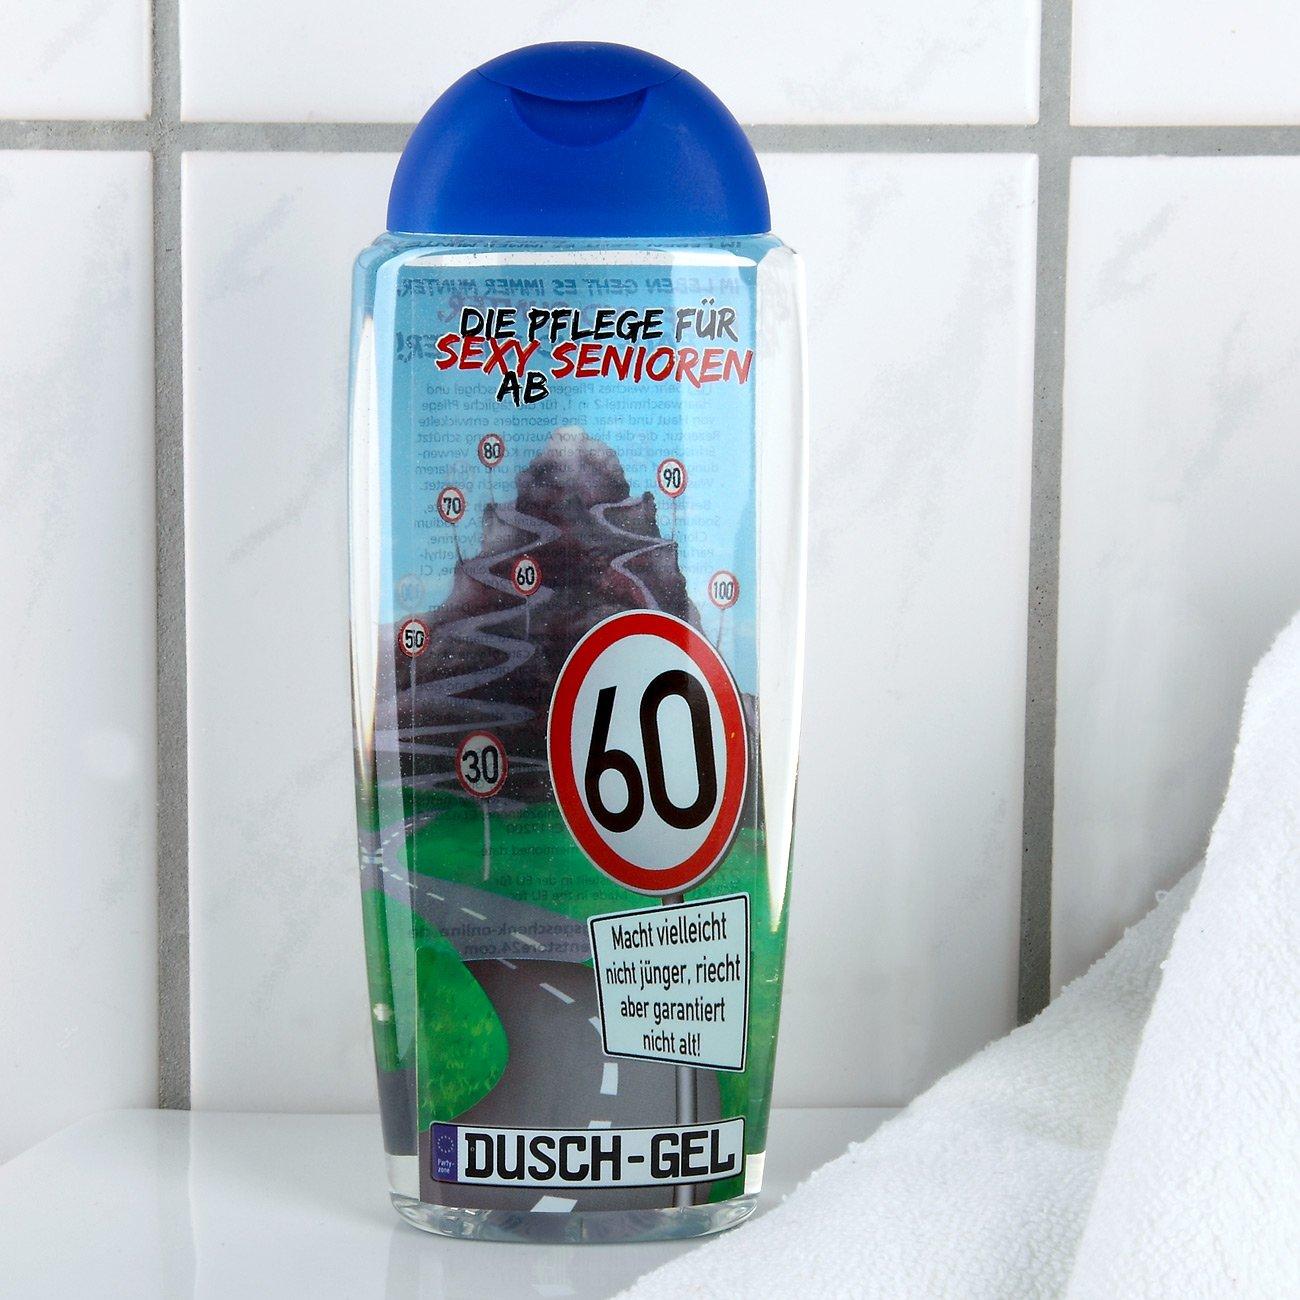 Lustapotheke® Duschgel Gegen Altersgeruch Zum 60. Geburtstag: Amazon.de:  Beauty